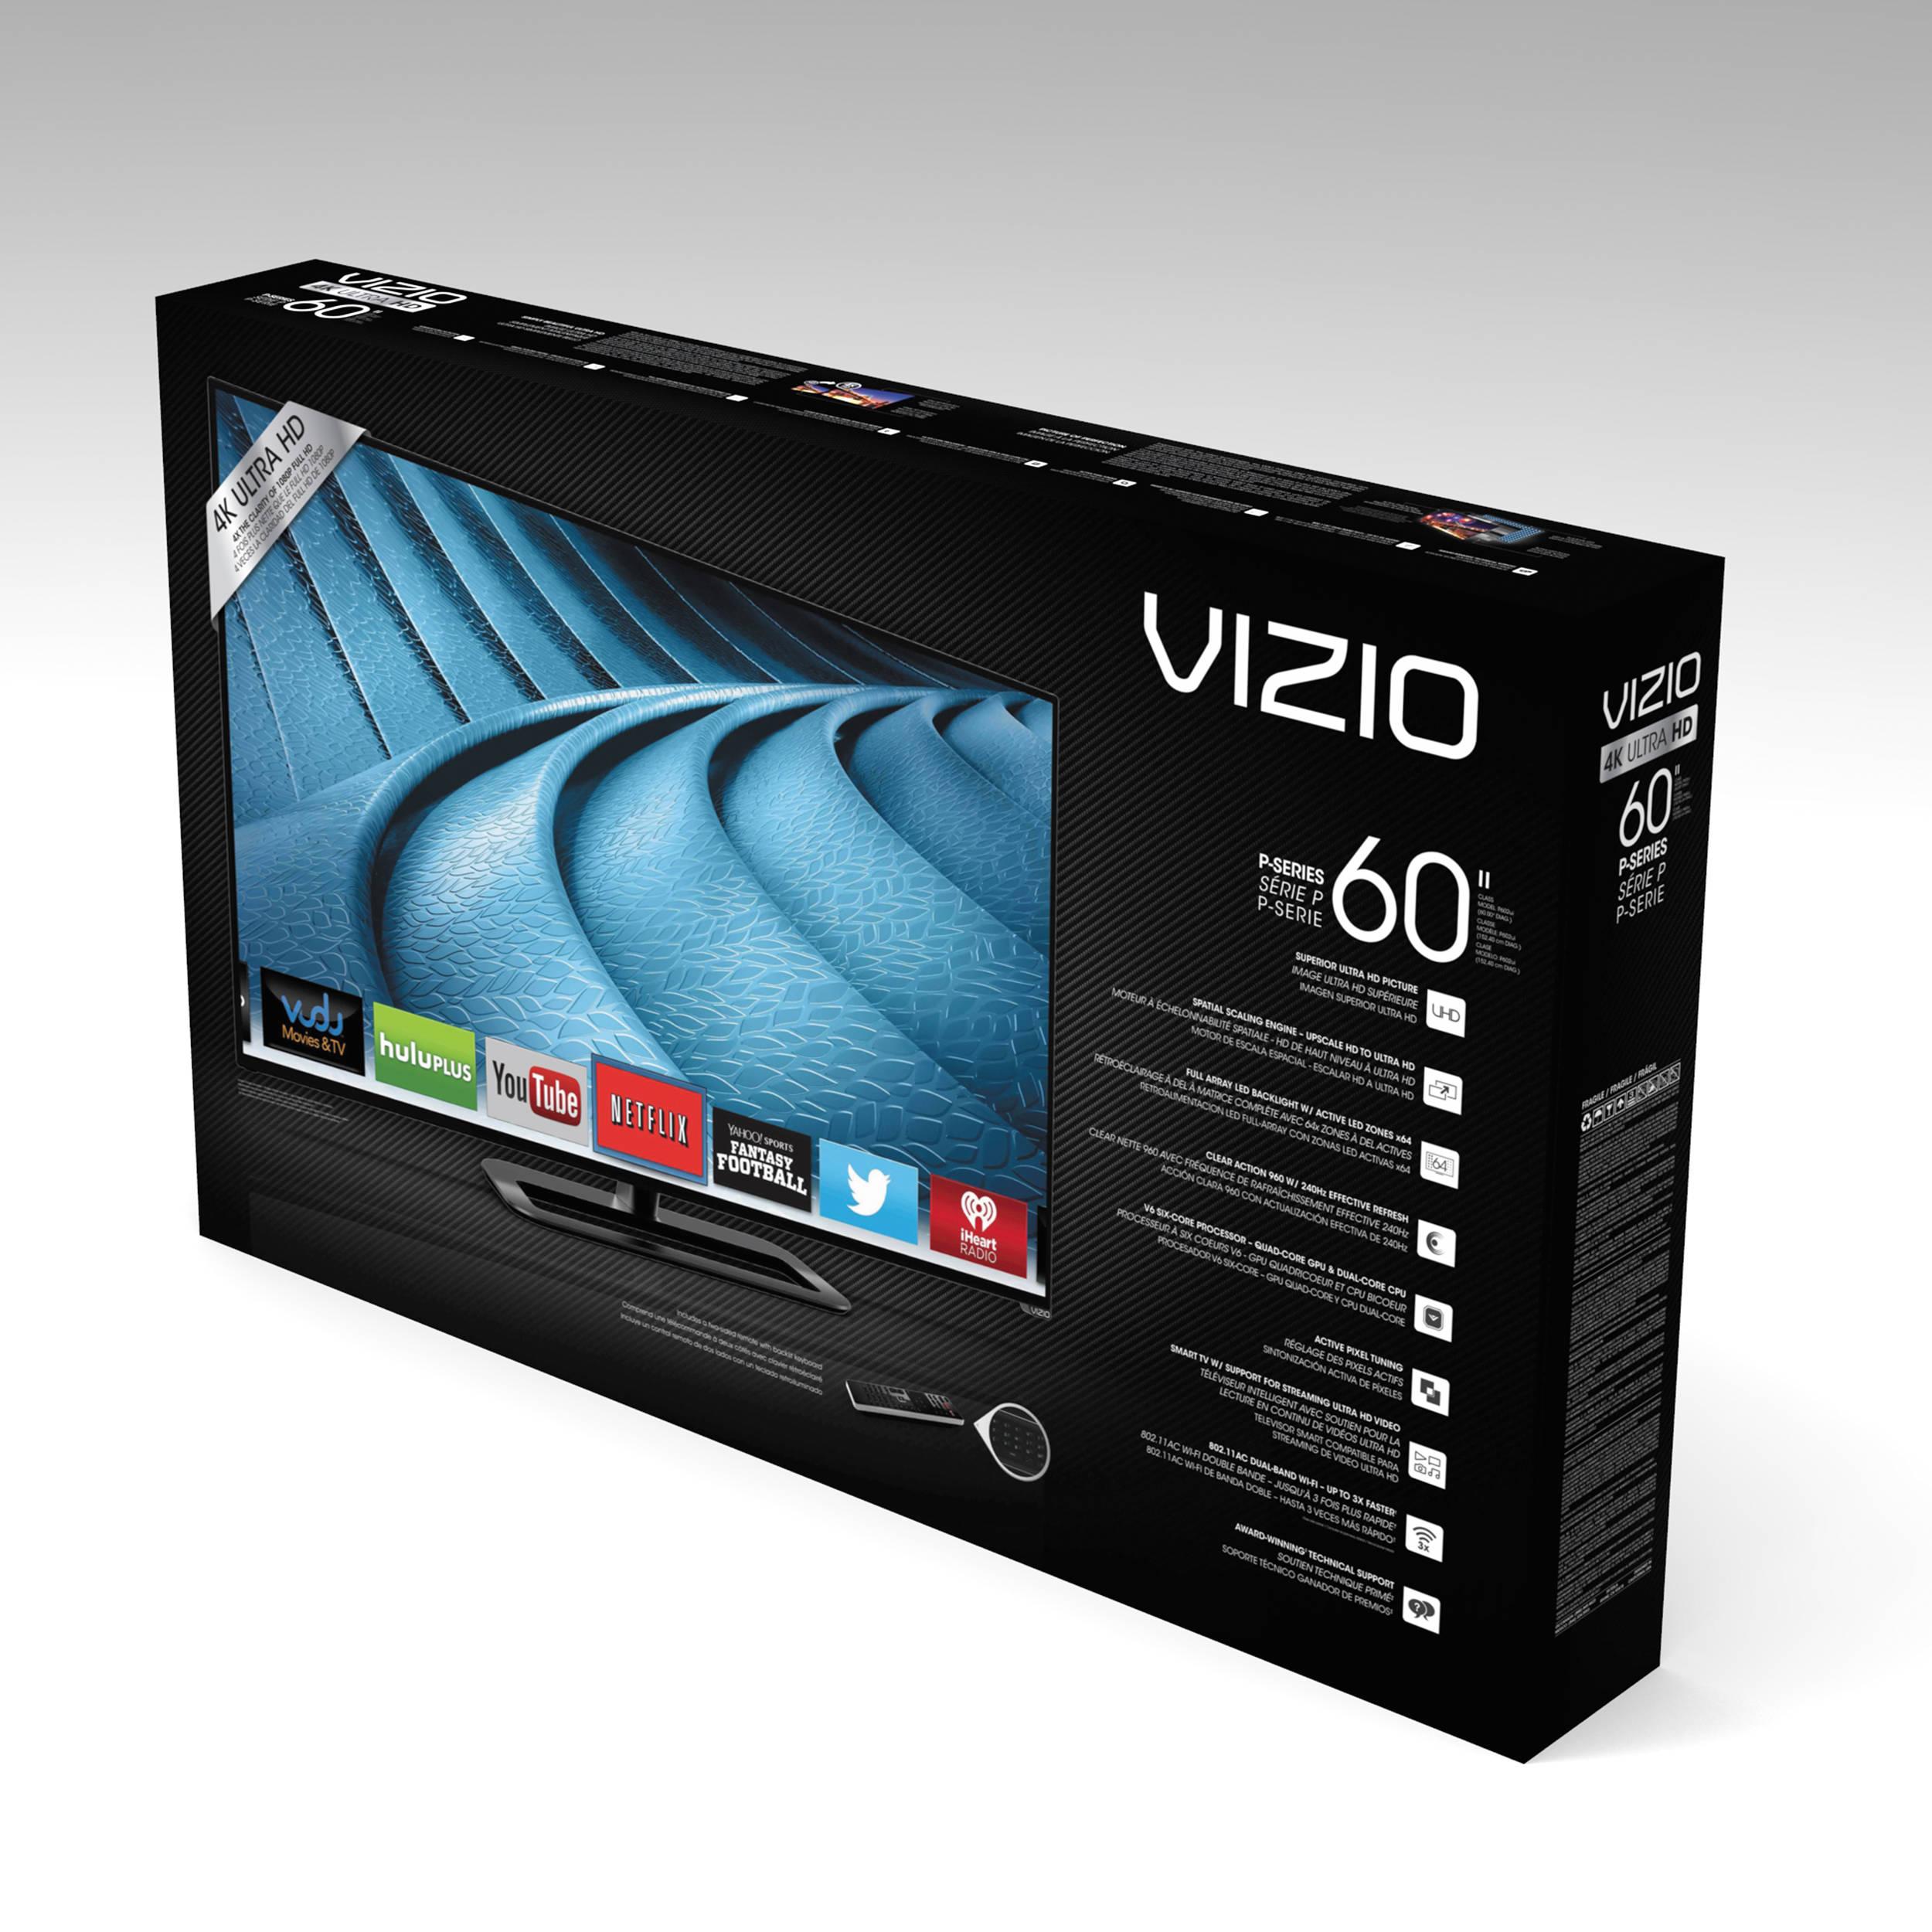 VIZIO P-Series 60